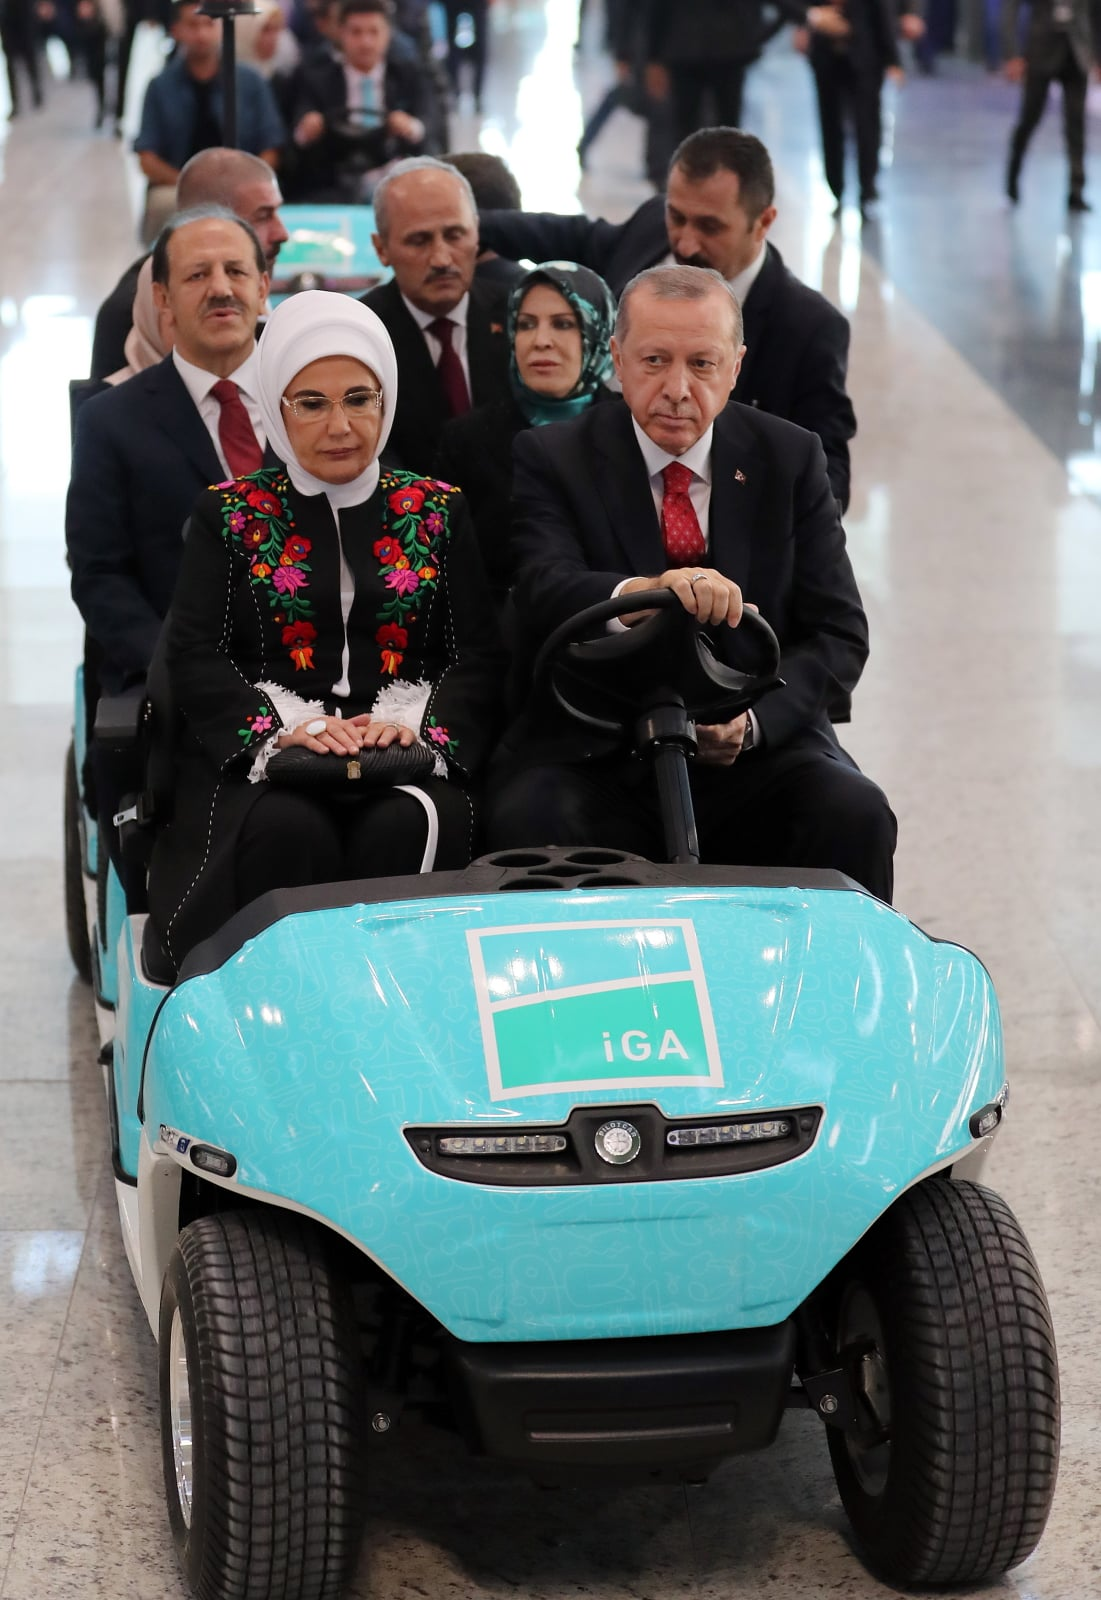 Prezydent Turcji Recep Erdogan z żoną na lotnisku w Stambule, Turcja. Fot. PAP/EPA/TURKISH PRESIDENTIAL PRESS OFFICE HANDOUT